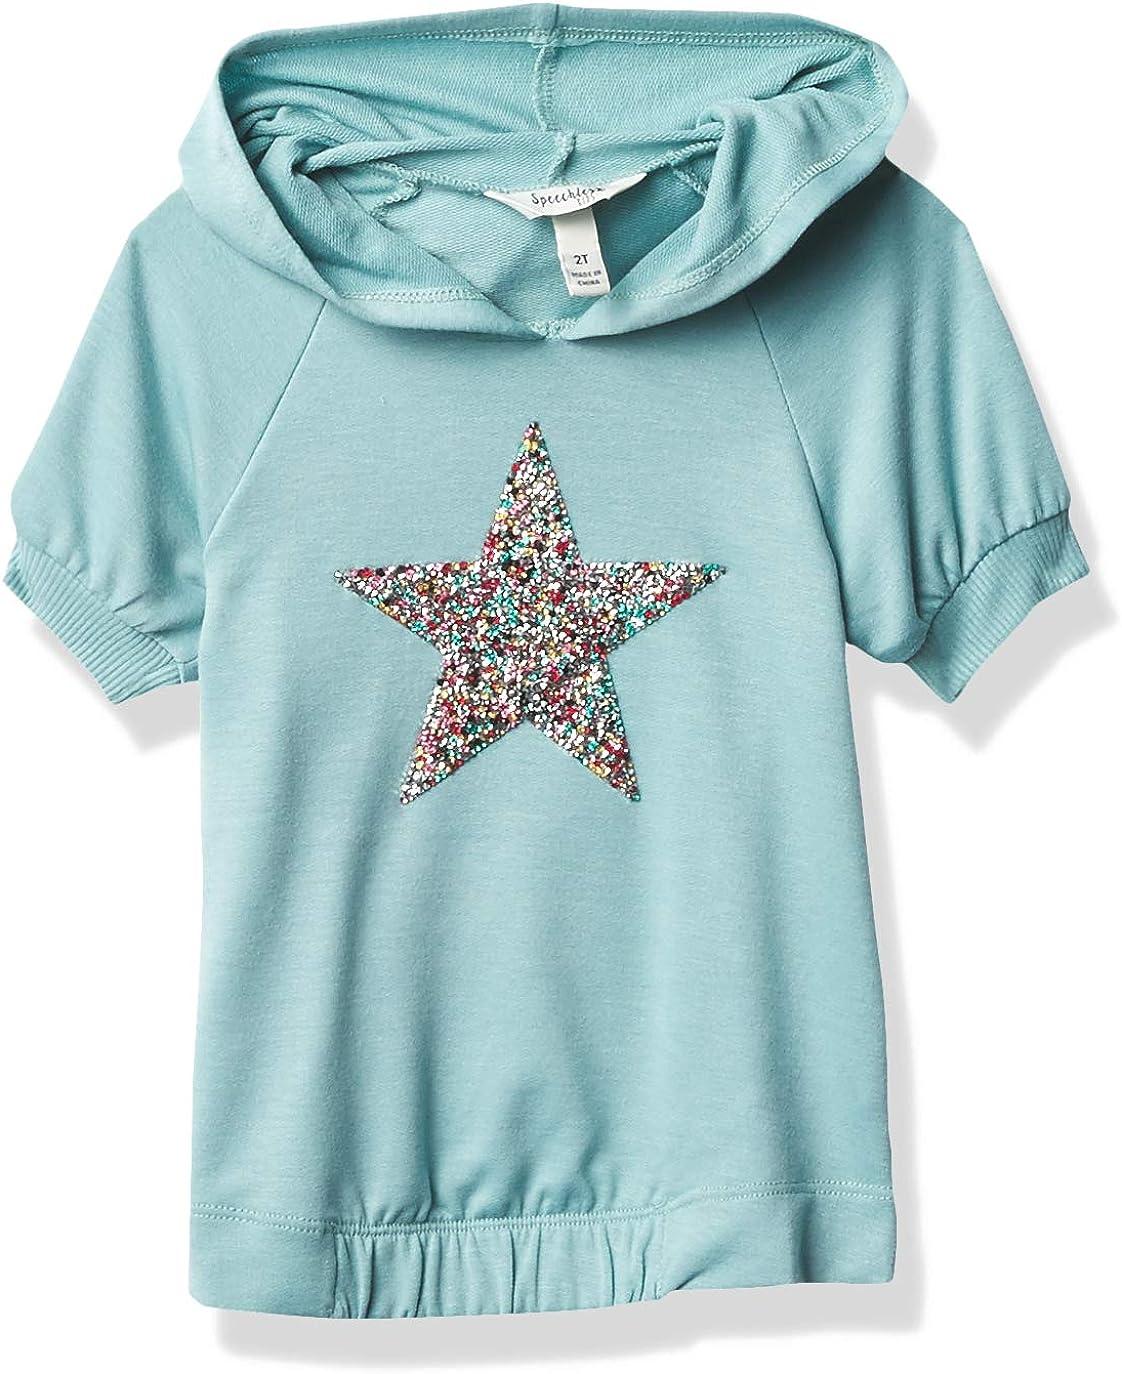 Max 87% OFF Speechless Girls' Short Cheap bargain Hoodie Sweatshirt Sleeve